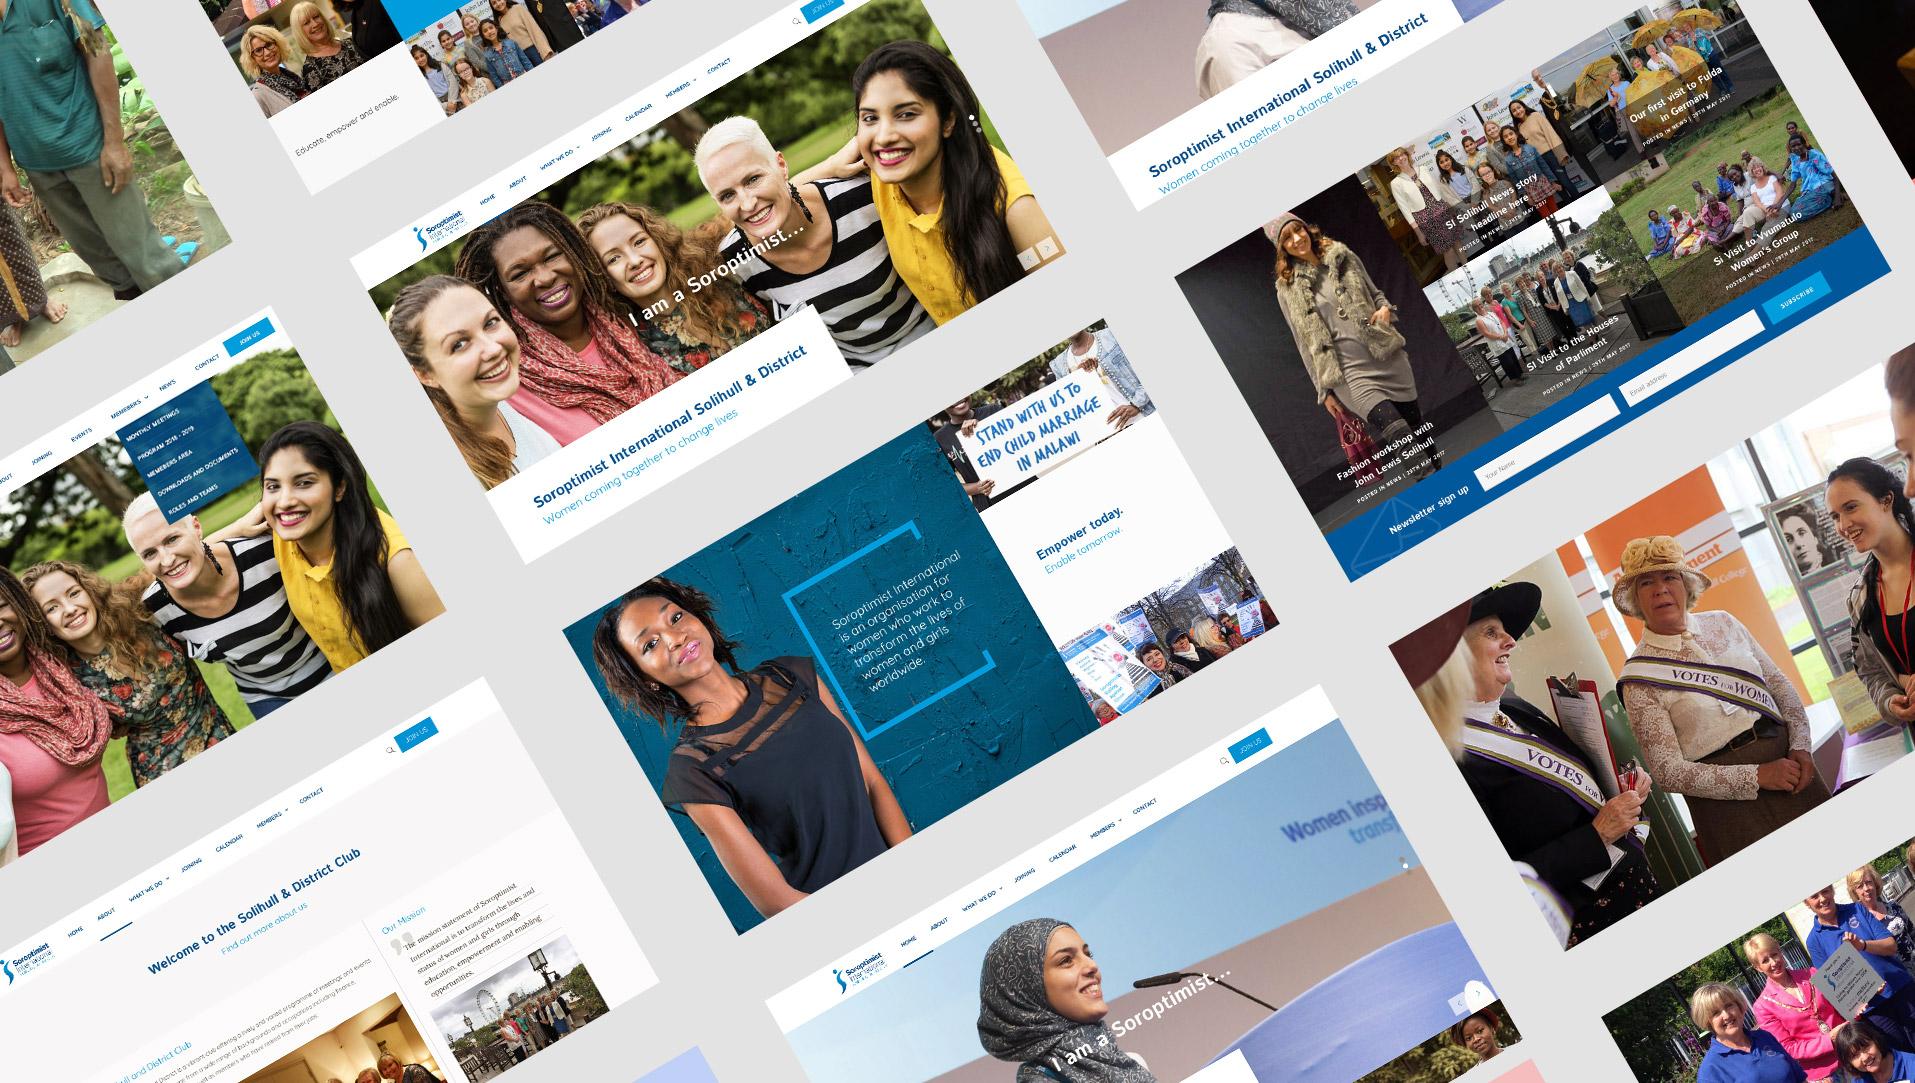 purnells website design